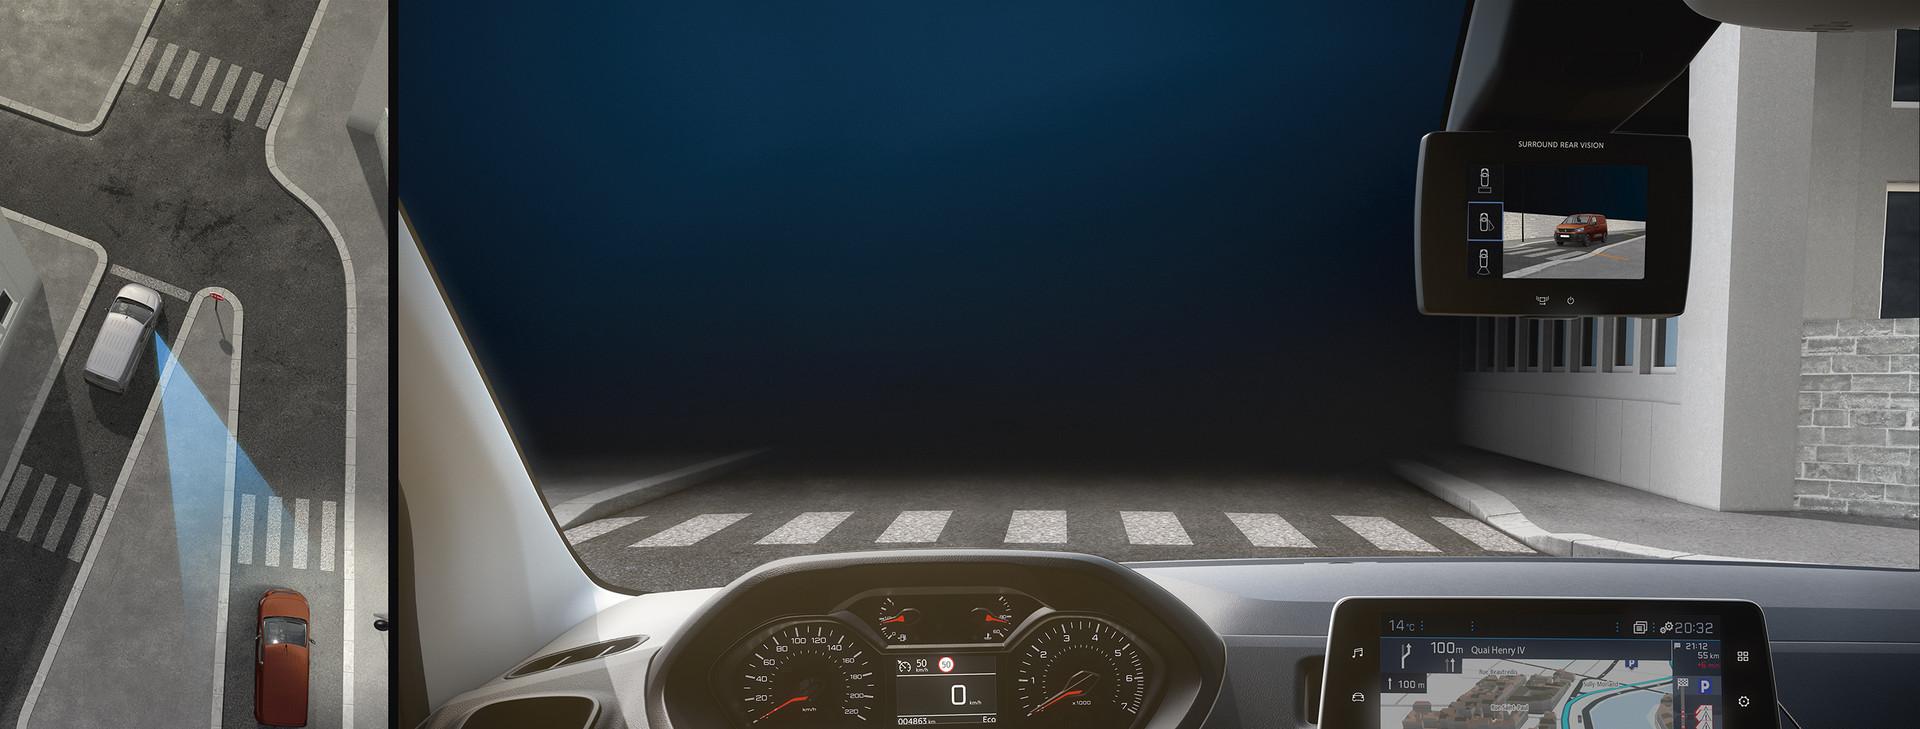 Bočné videnie na Peugeot Parnter